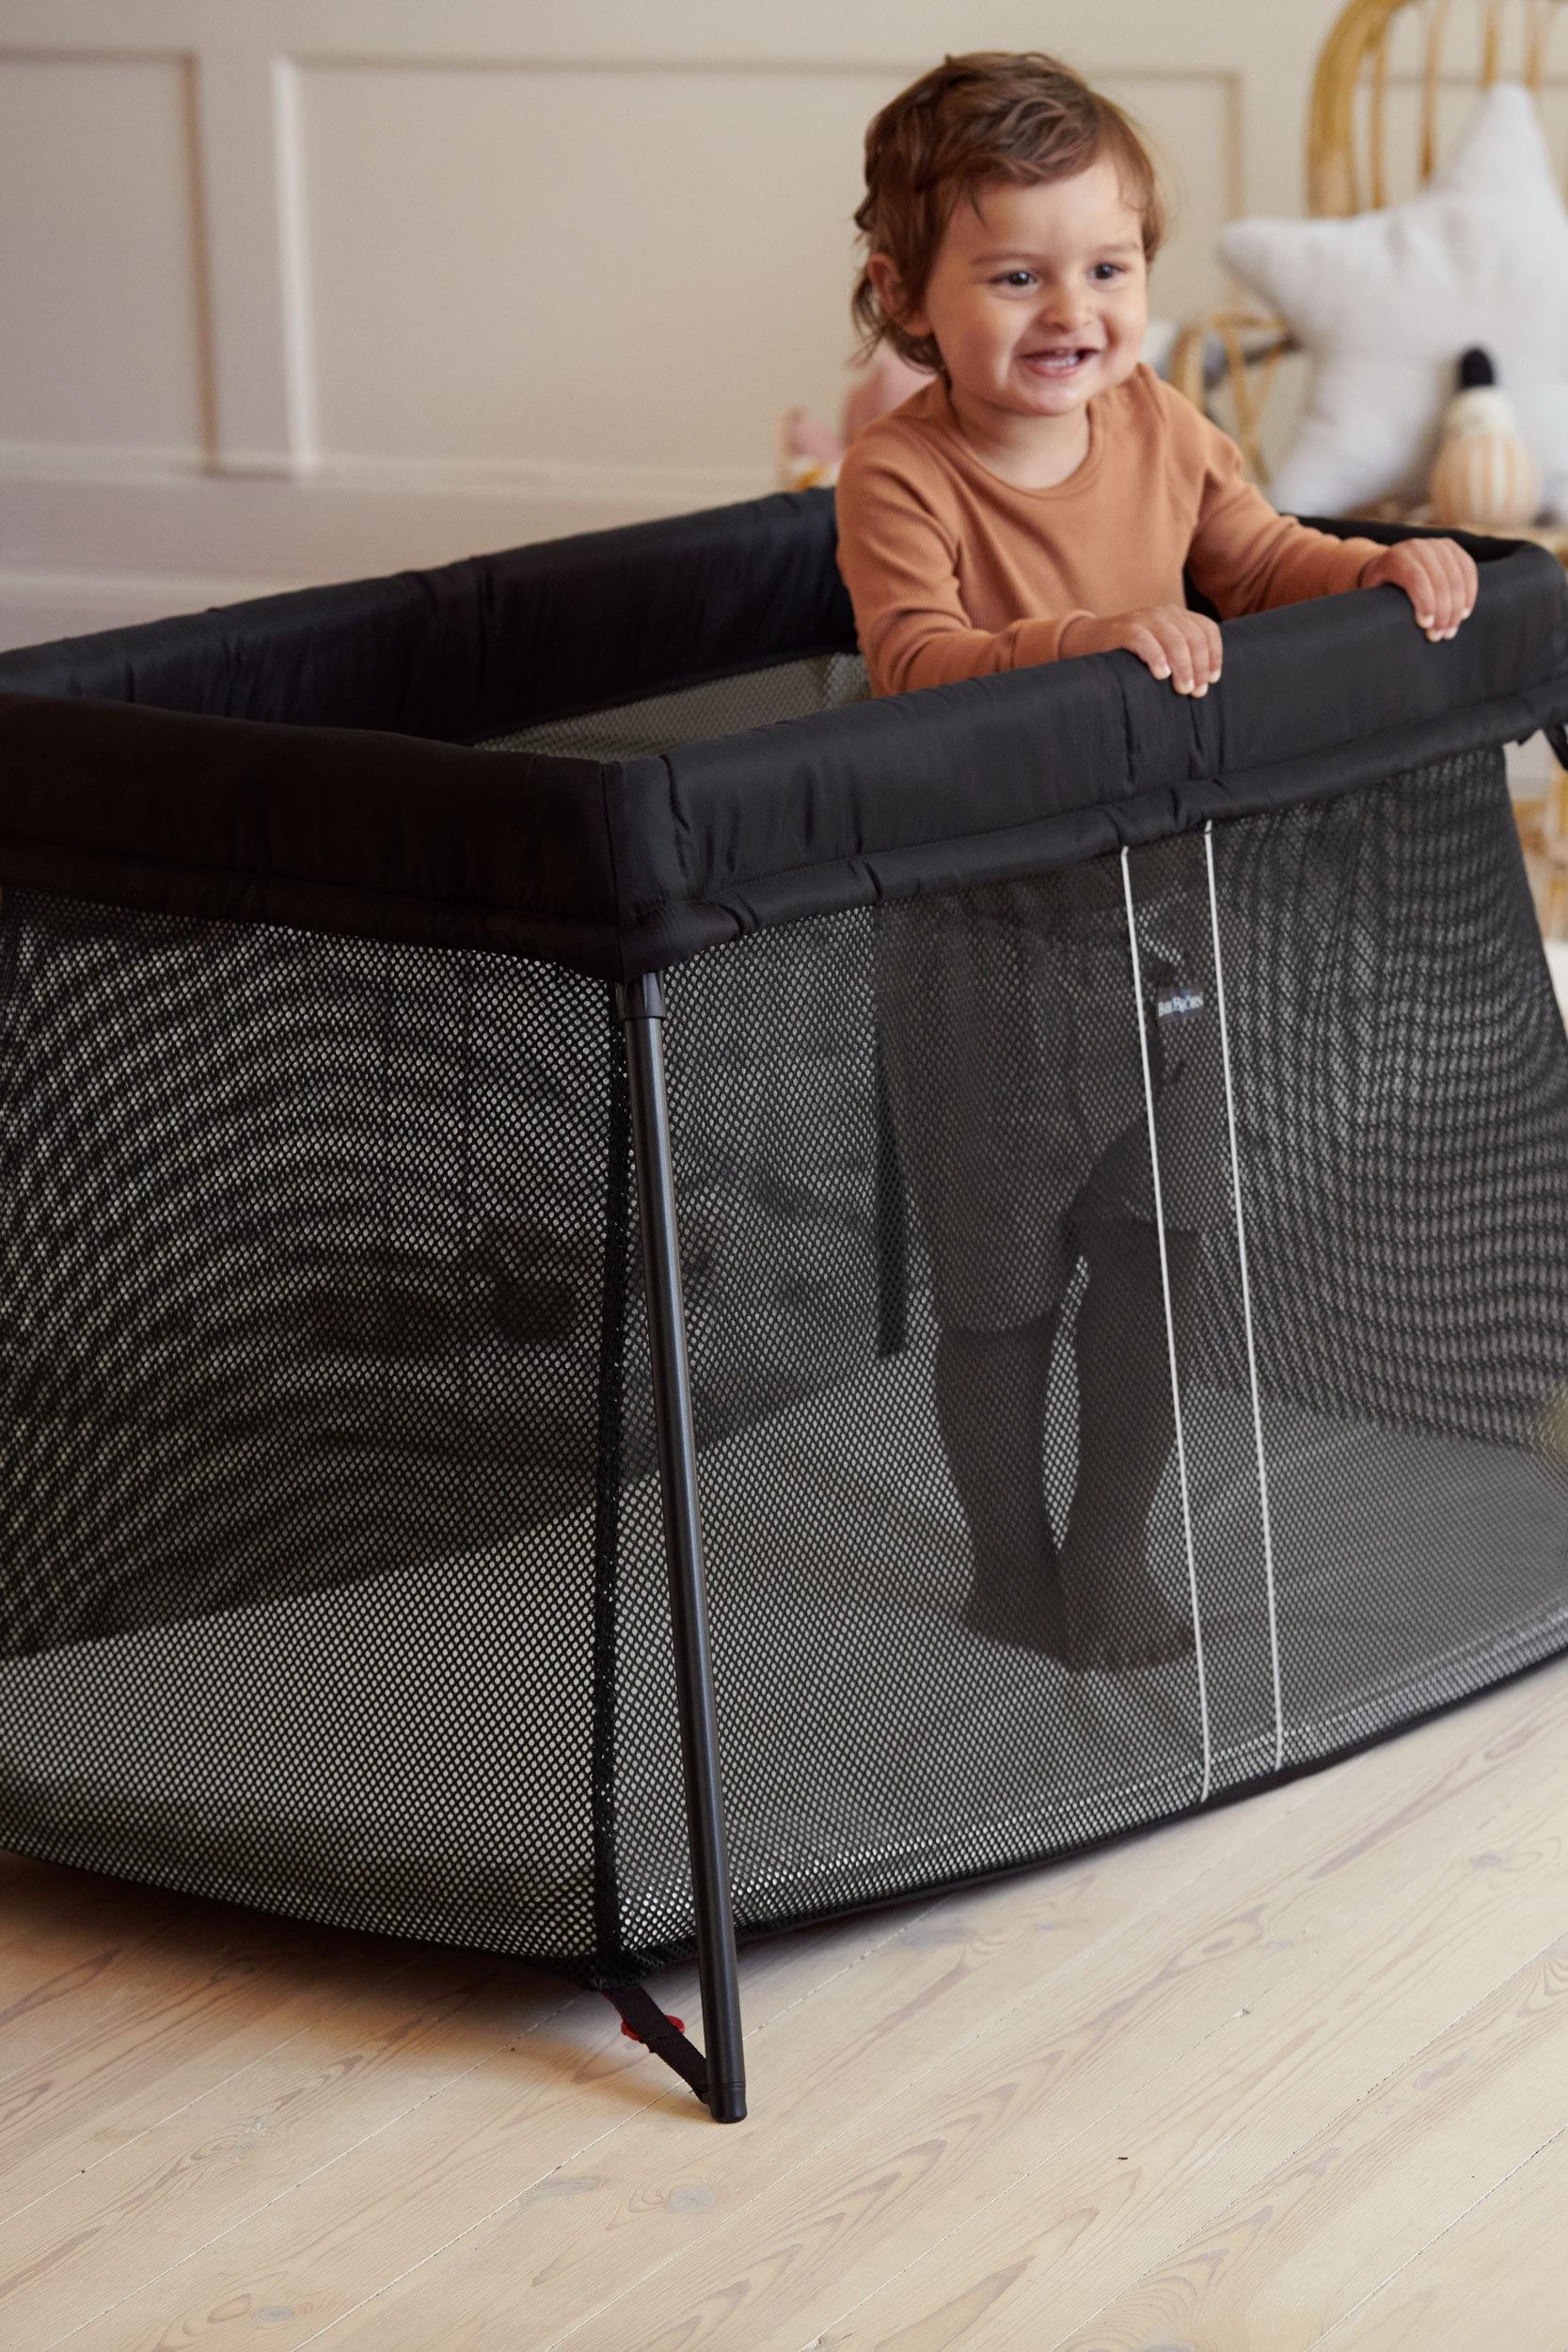 Handy Travel Crib In A Classic Design Babybjorn